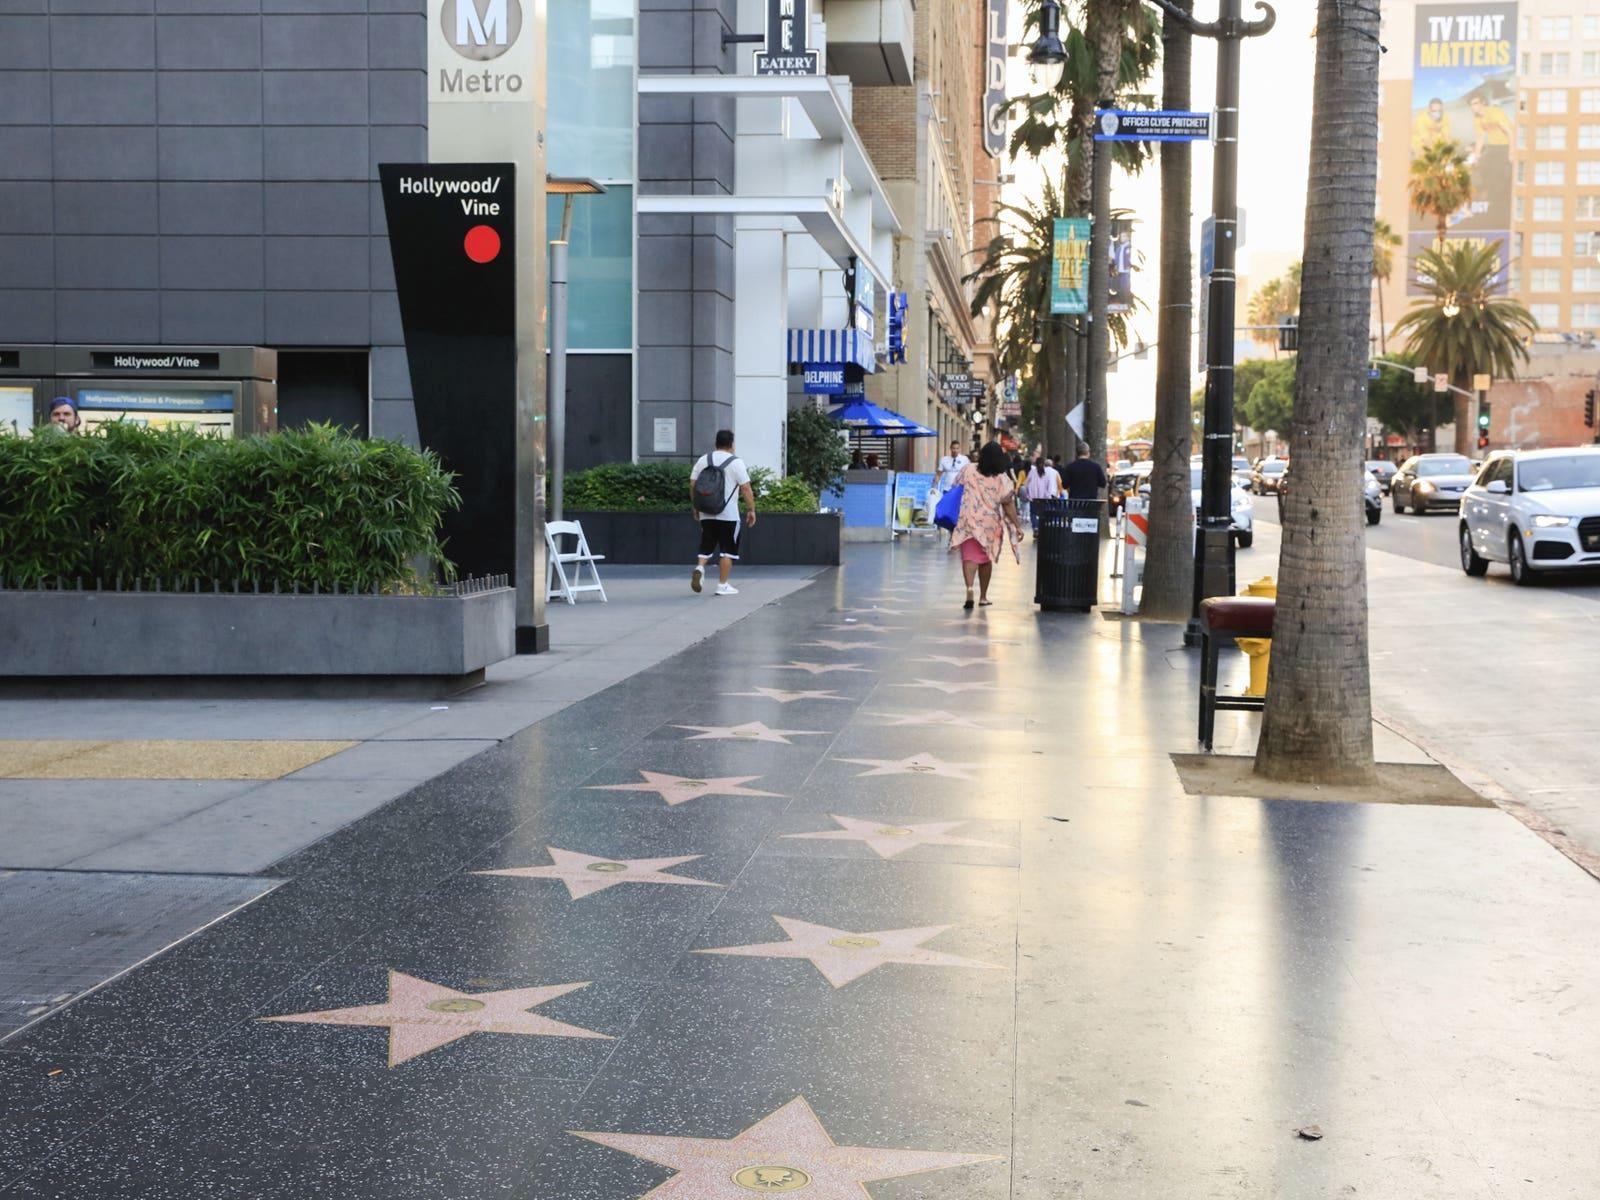 Hollywood Walk of Fame at Metro Hollywood/Vine Station